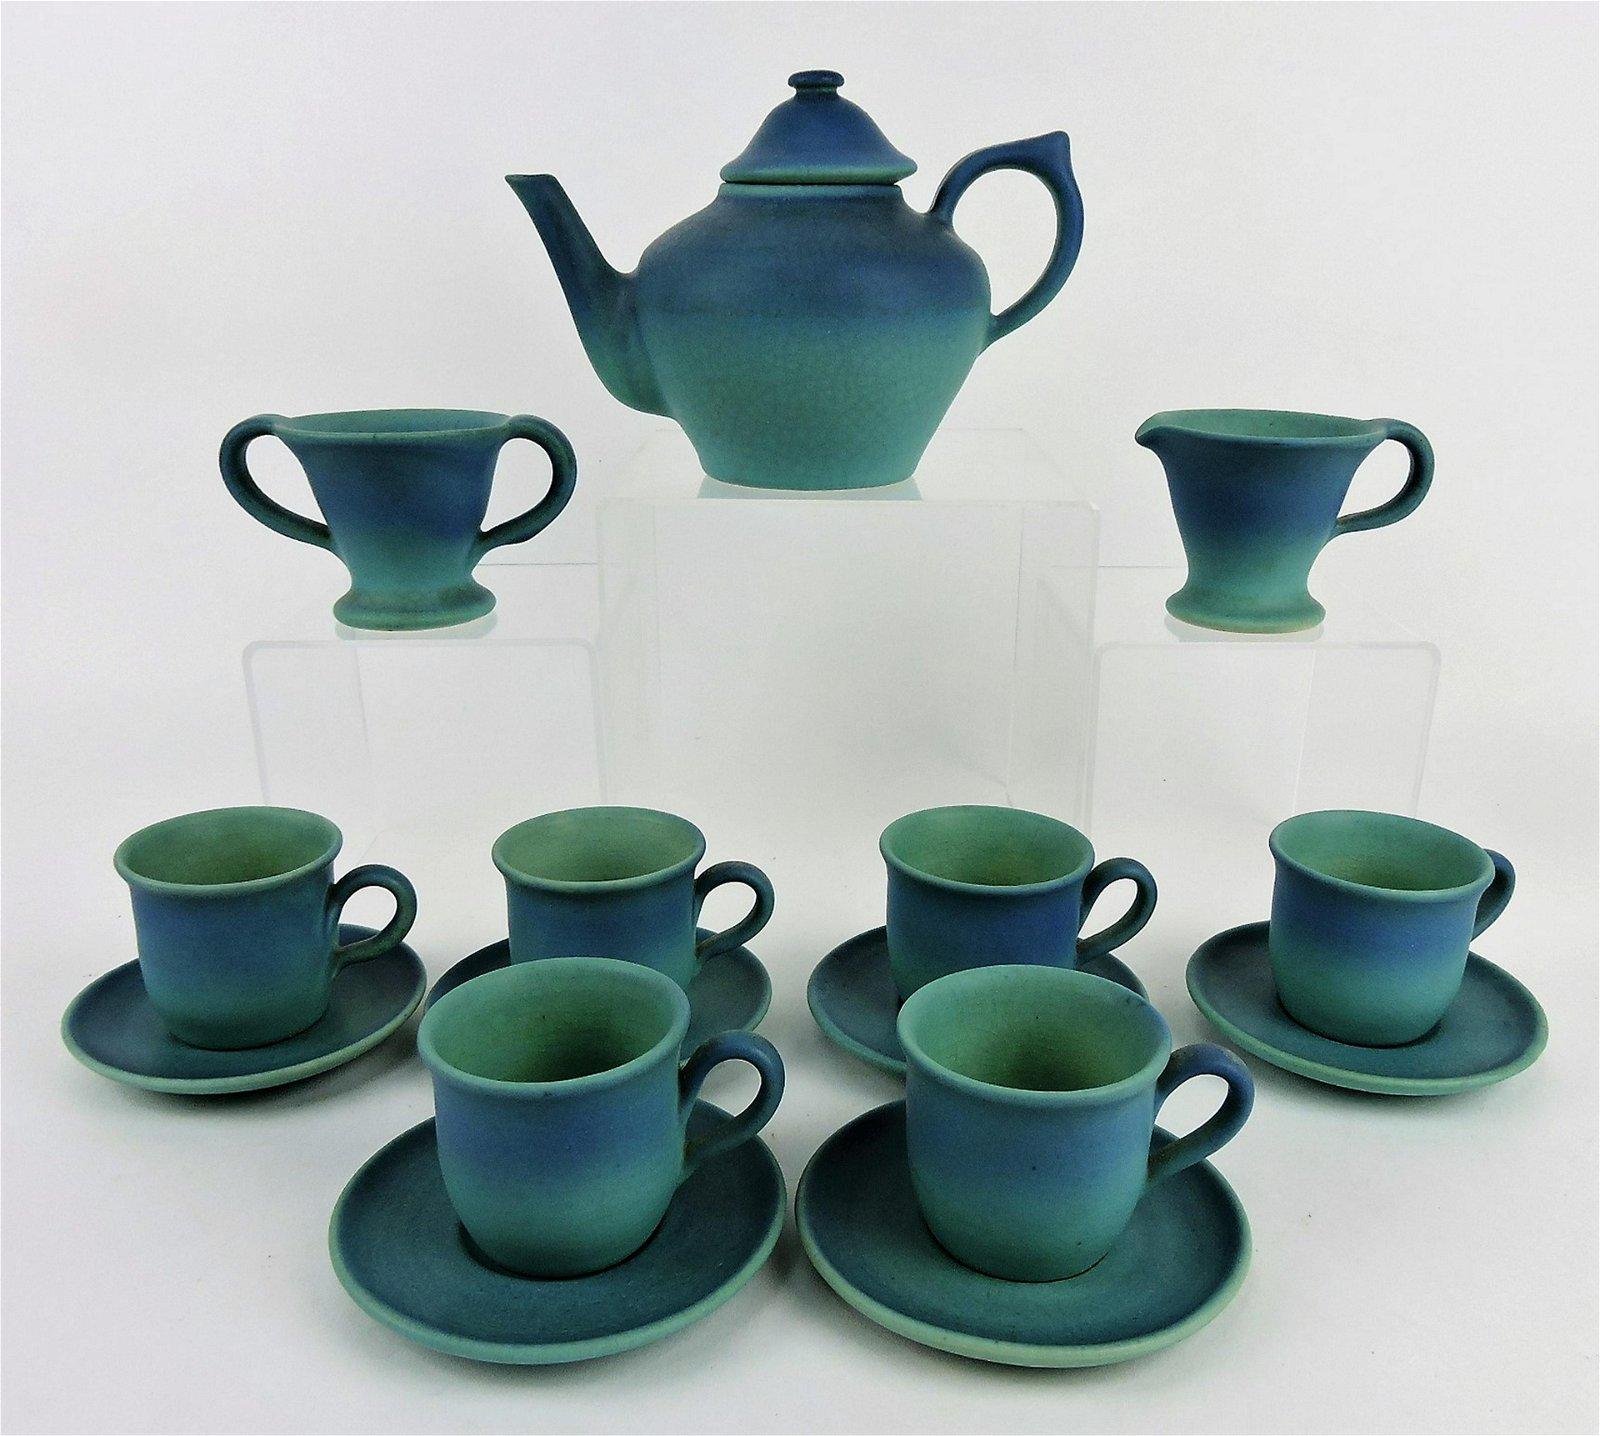 Van Briggle blue tea set with teapot,